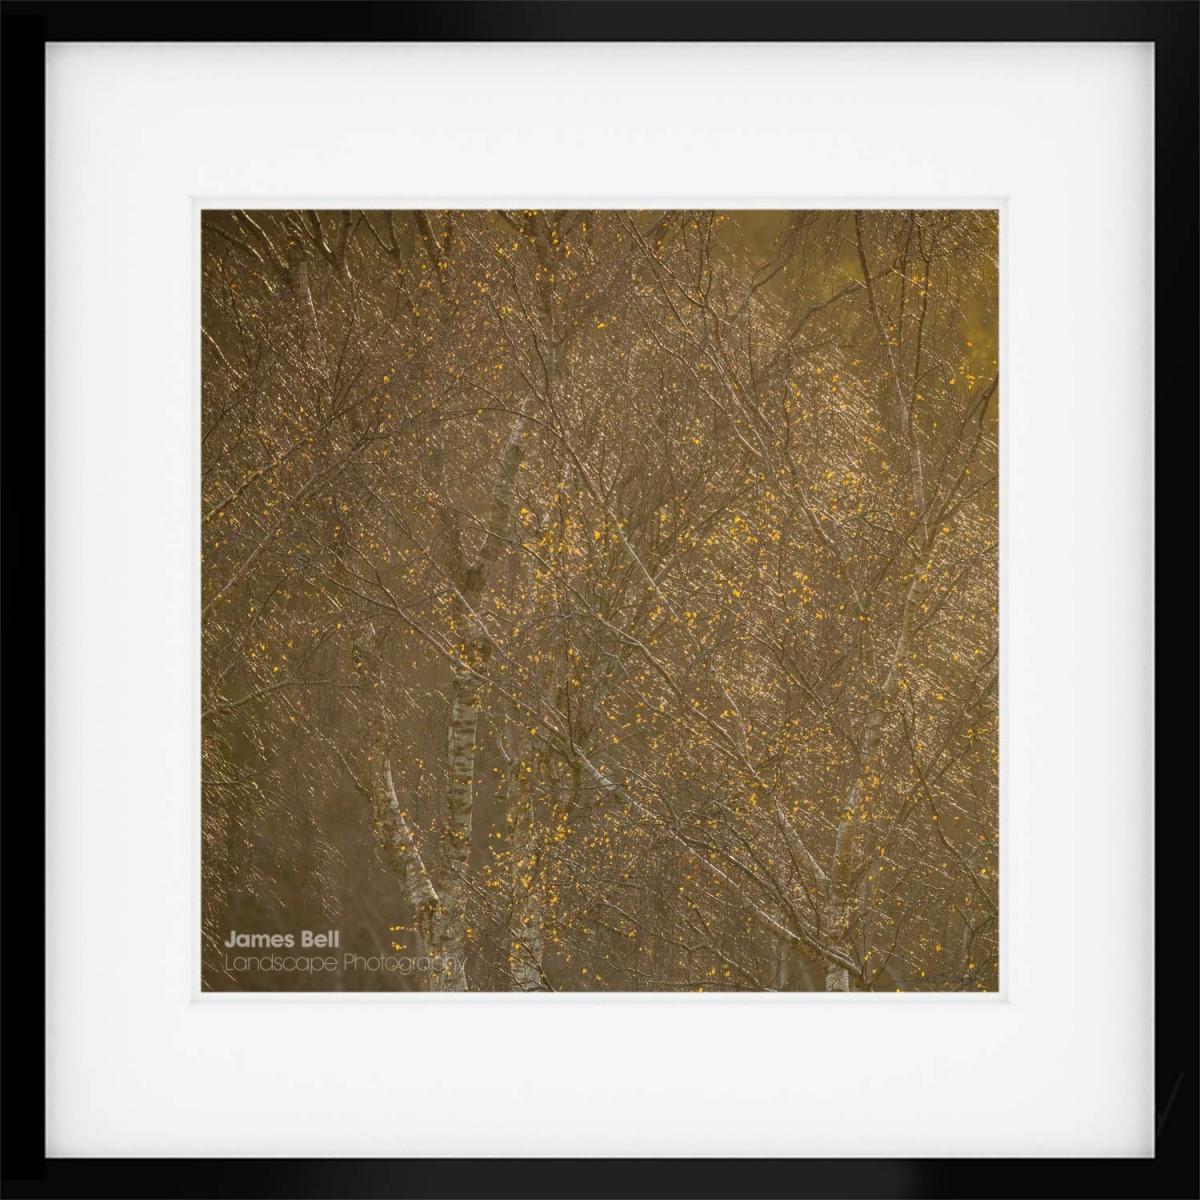 Silver Birch Autumn framed print